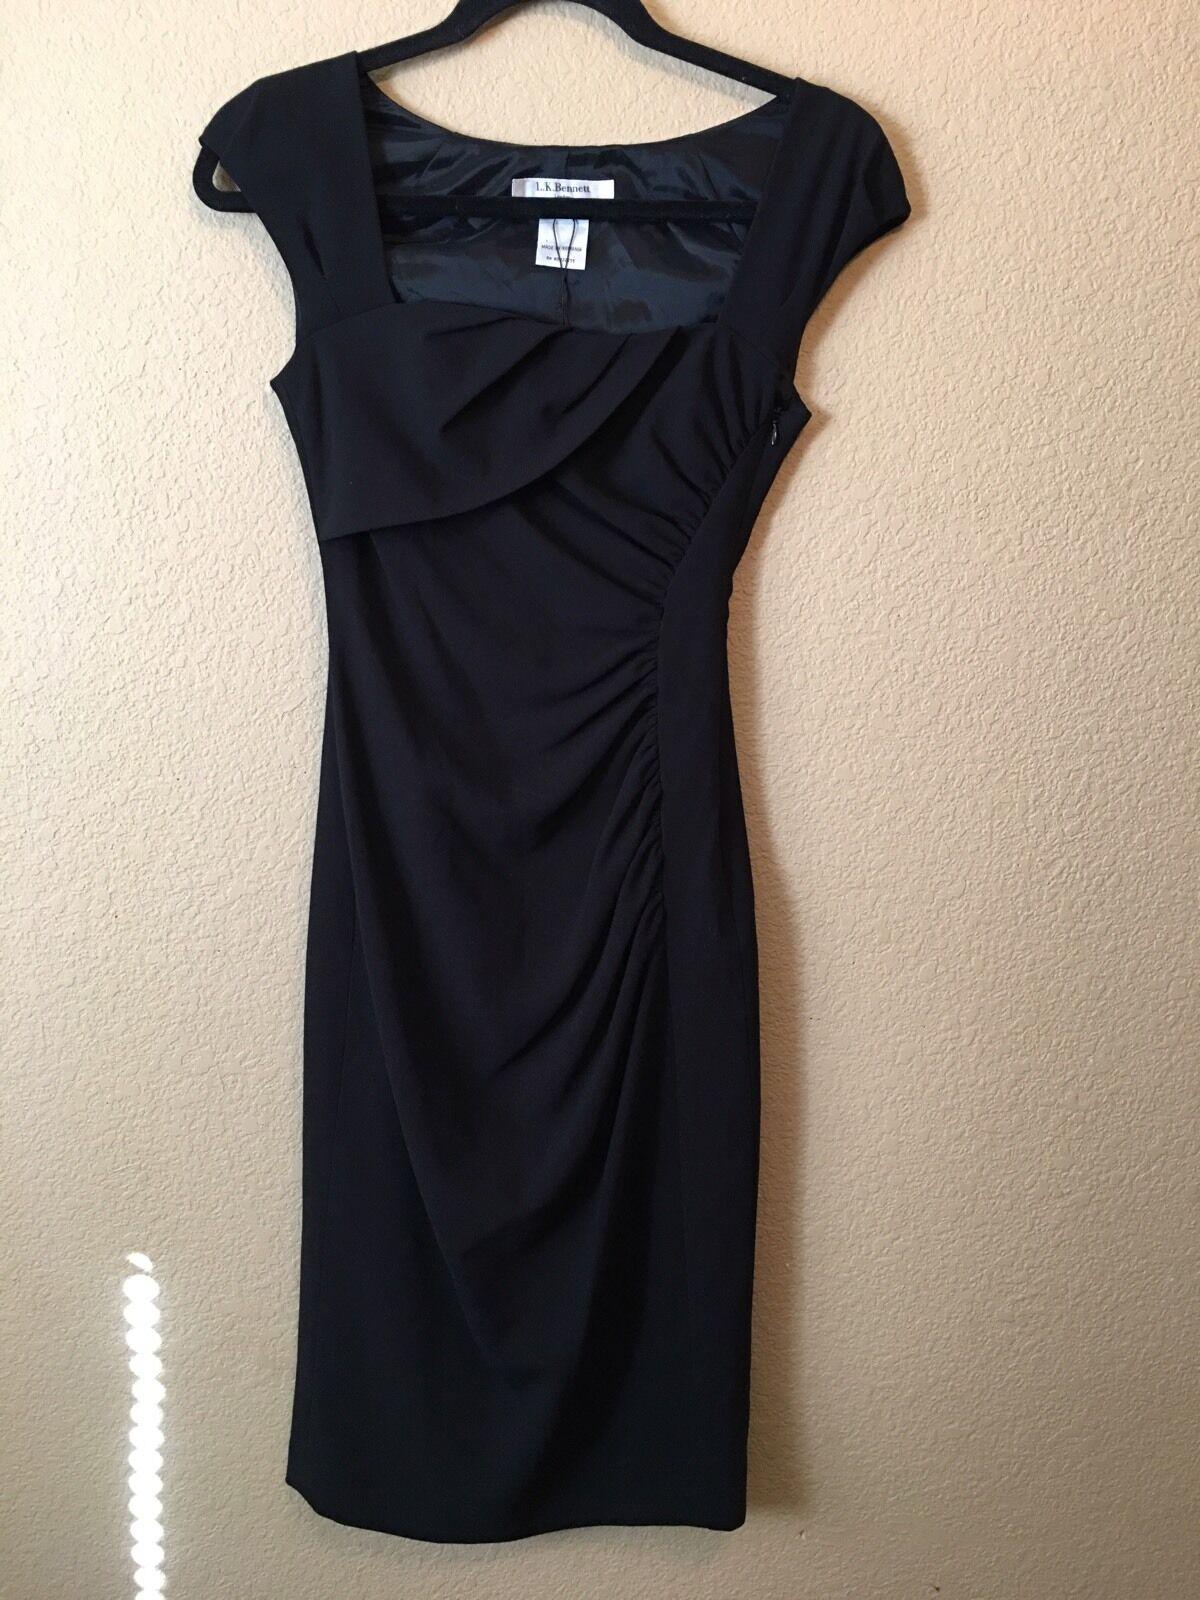 NWT LK Bennett Stunner Fitted Dress Classy US 2 XS schwarz